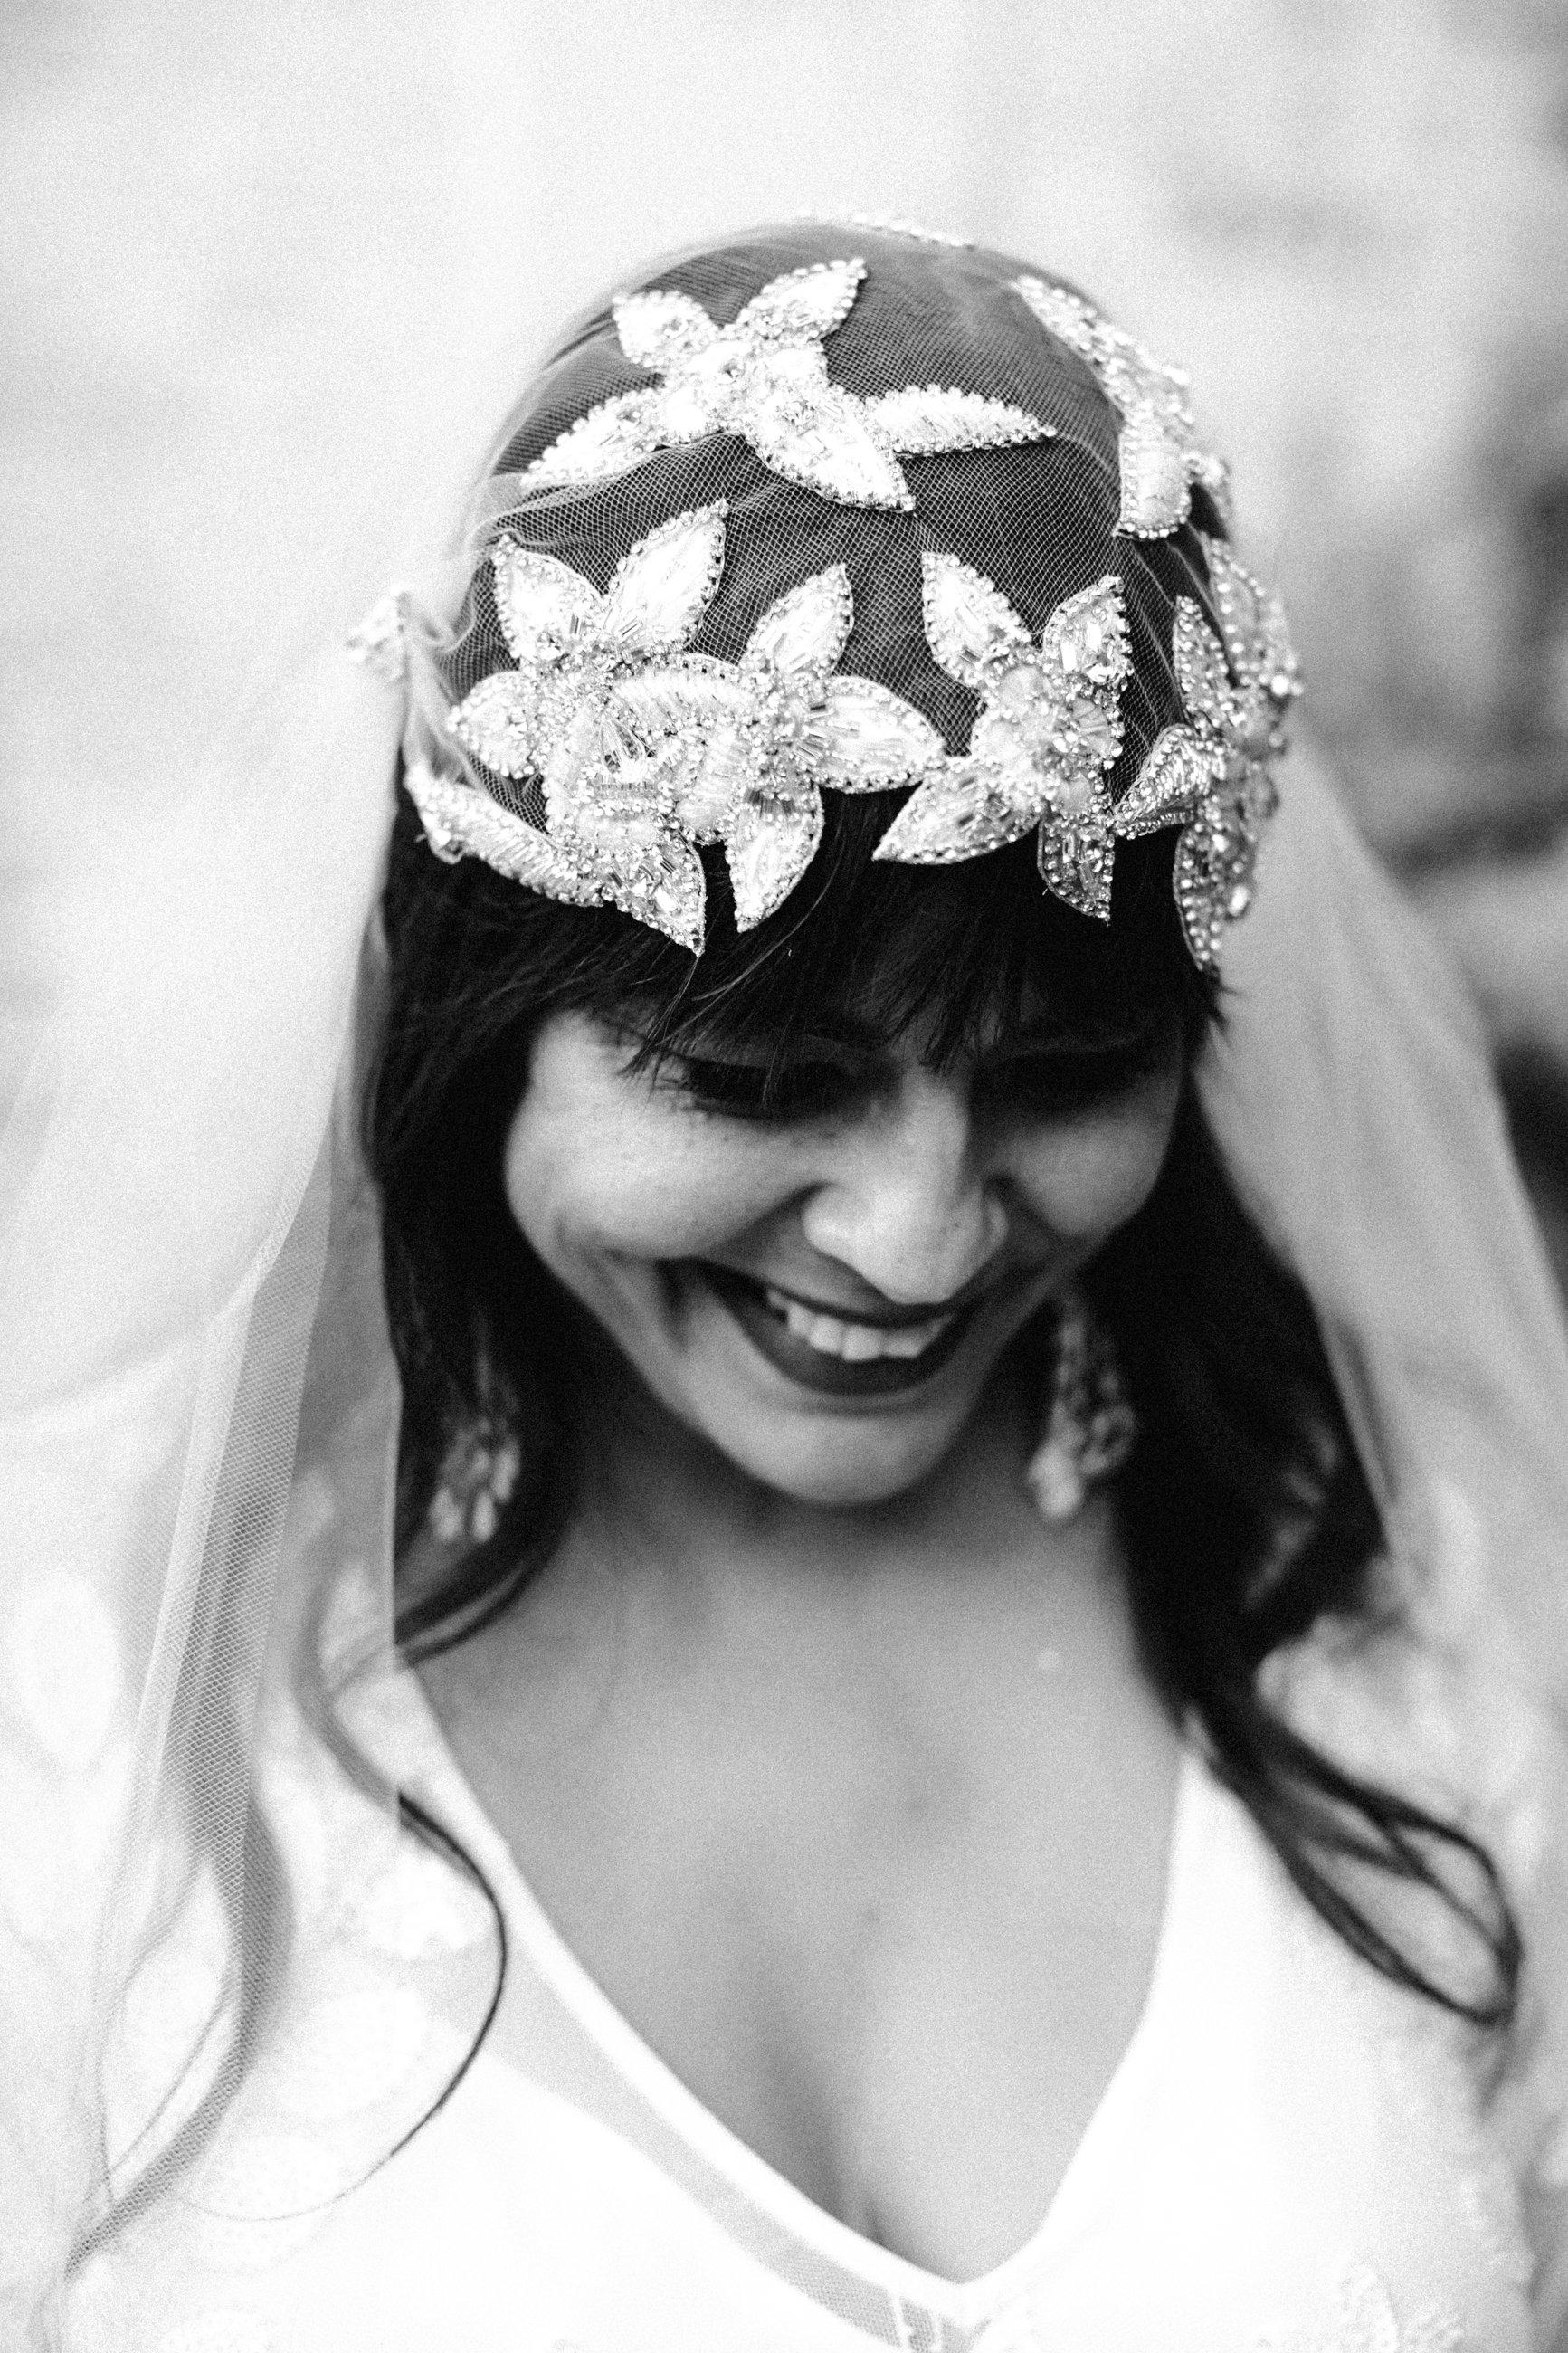 Real Bride wearing Untamed Petals hand beaded Berlin Cap veil